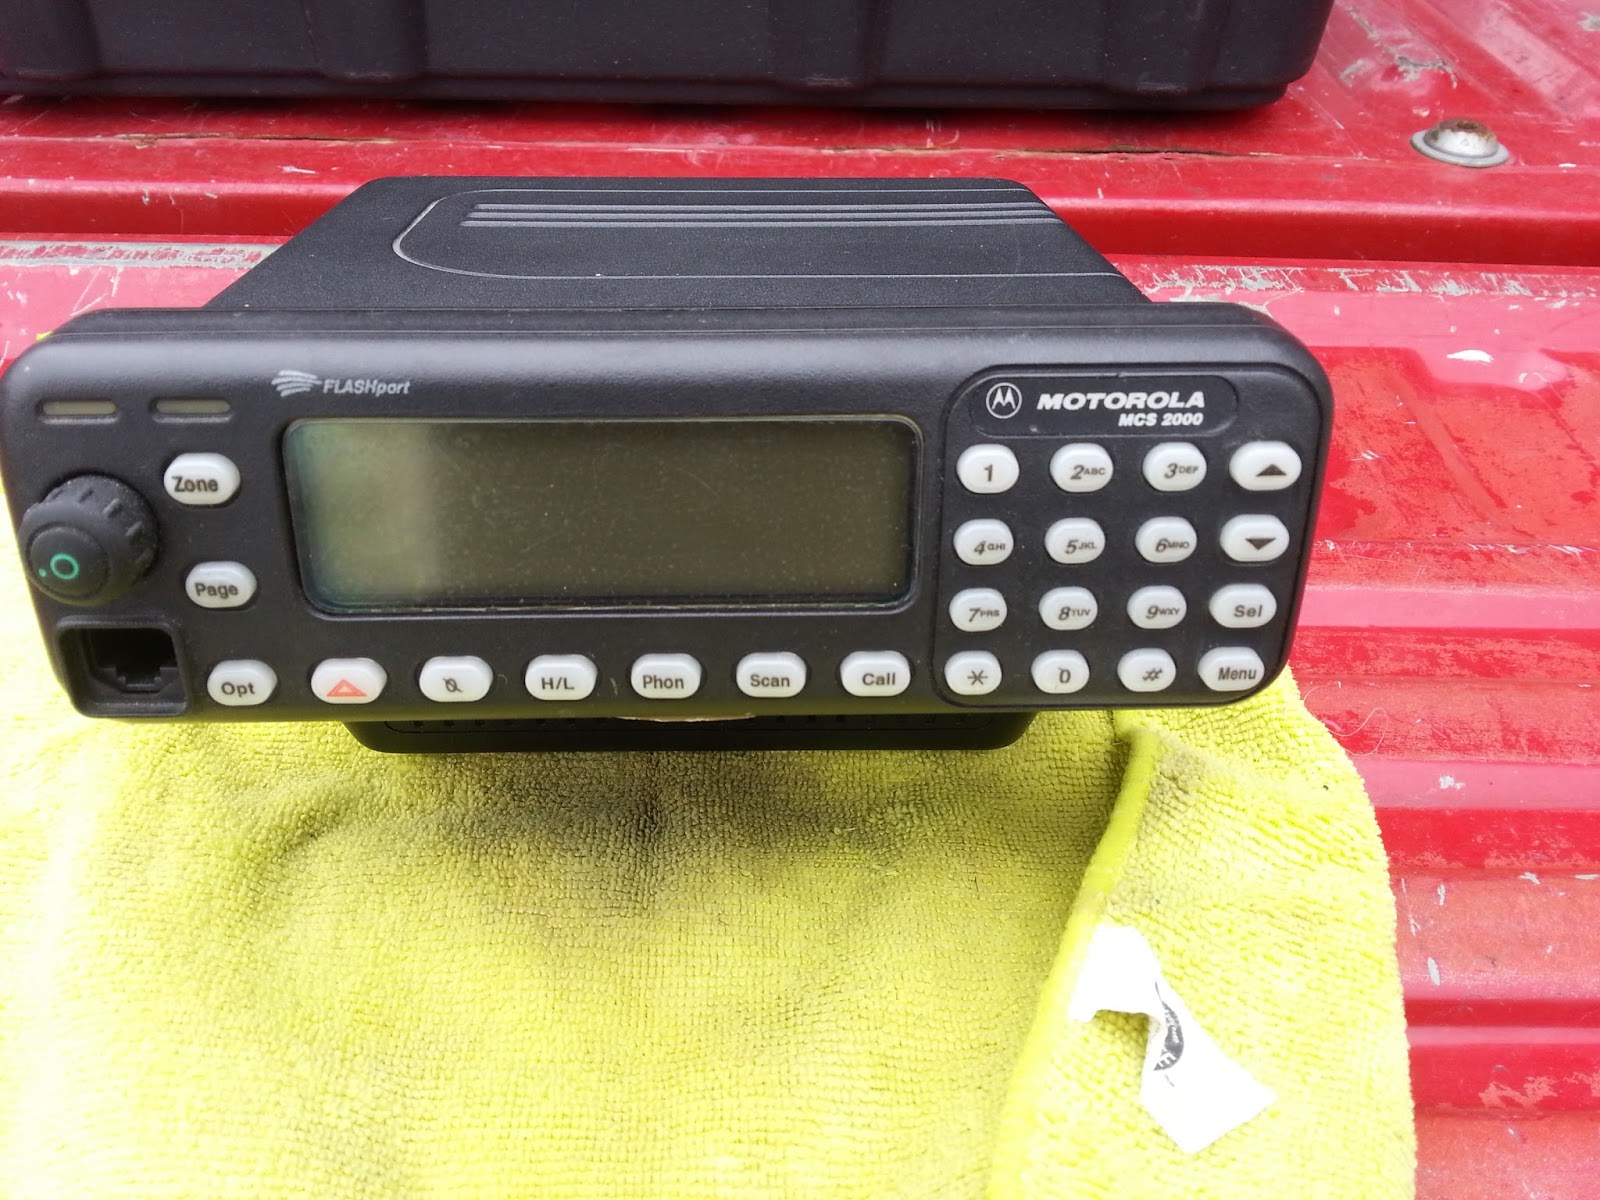 MCS2000 900 MHz Model 3 - 30 watt